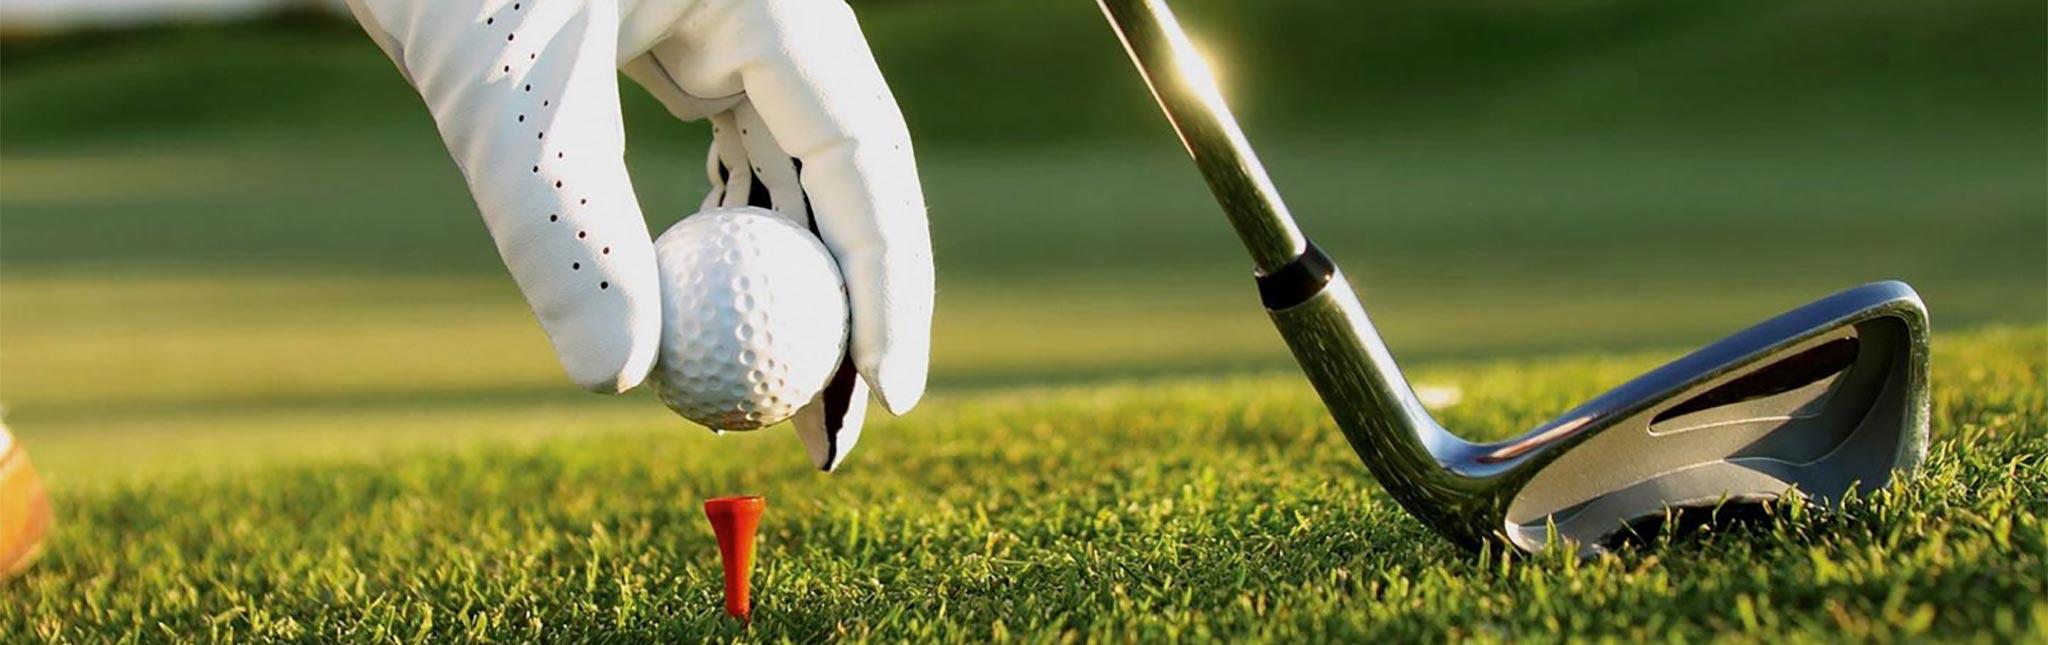 golf_ball_club2048x645.jpg